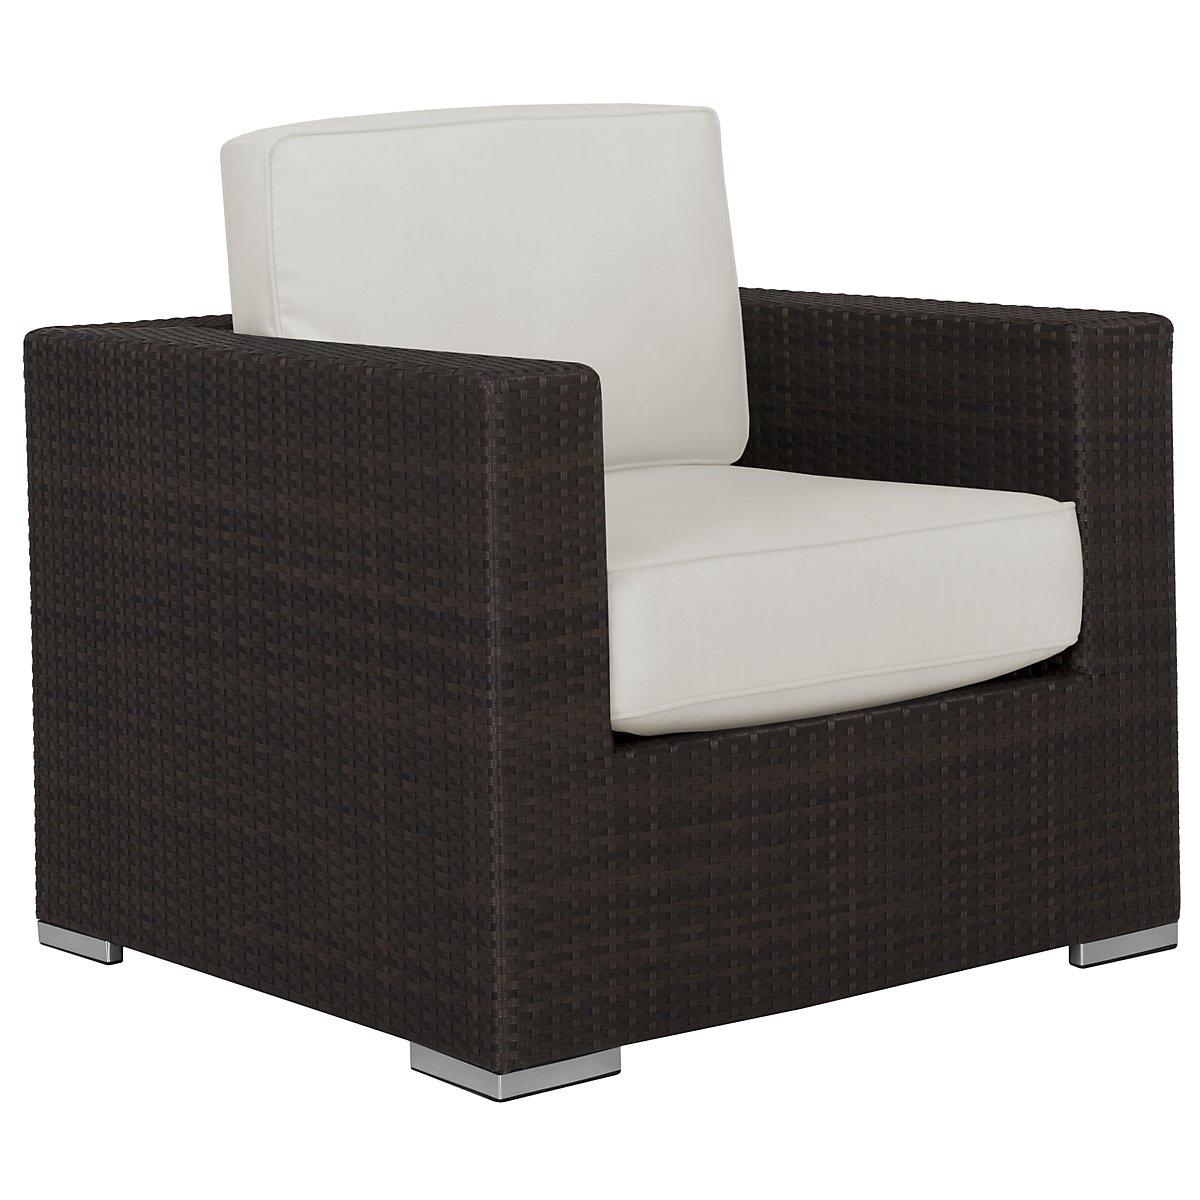 Outdoor Living Room Sets City Furniture Fina White Outdoor Living Room Set